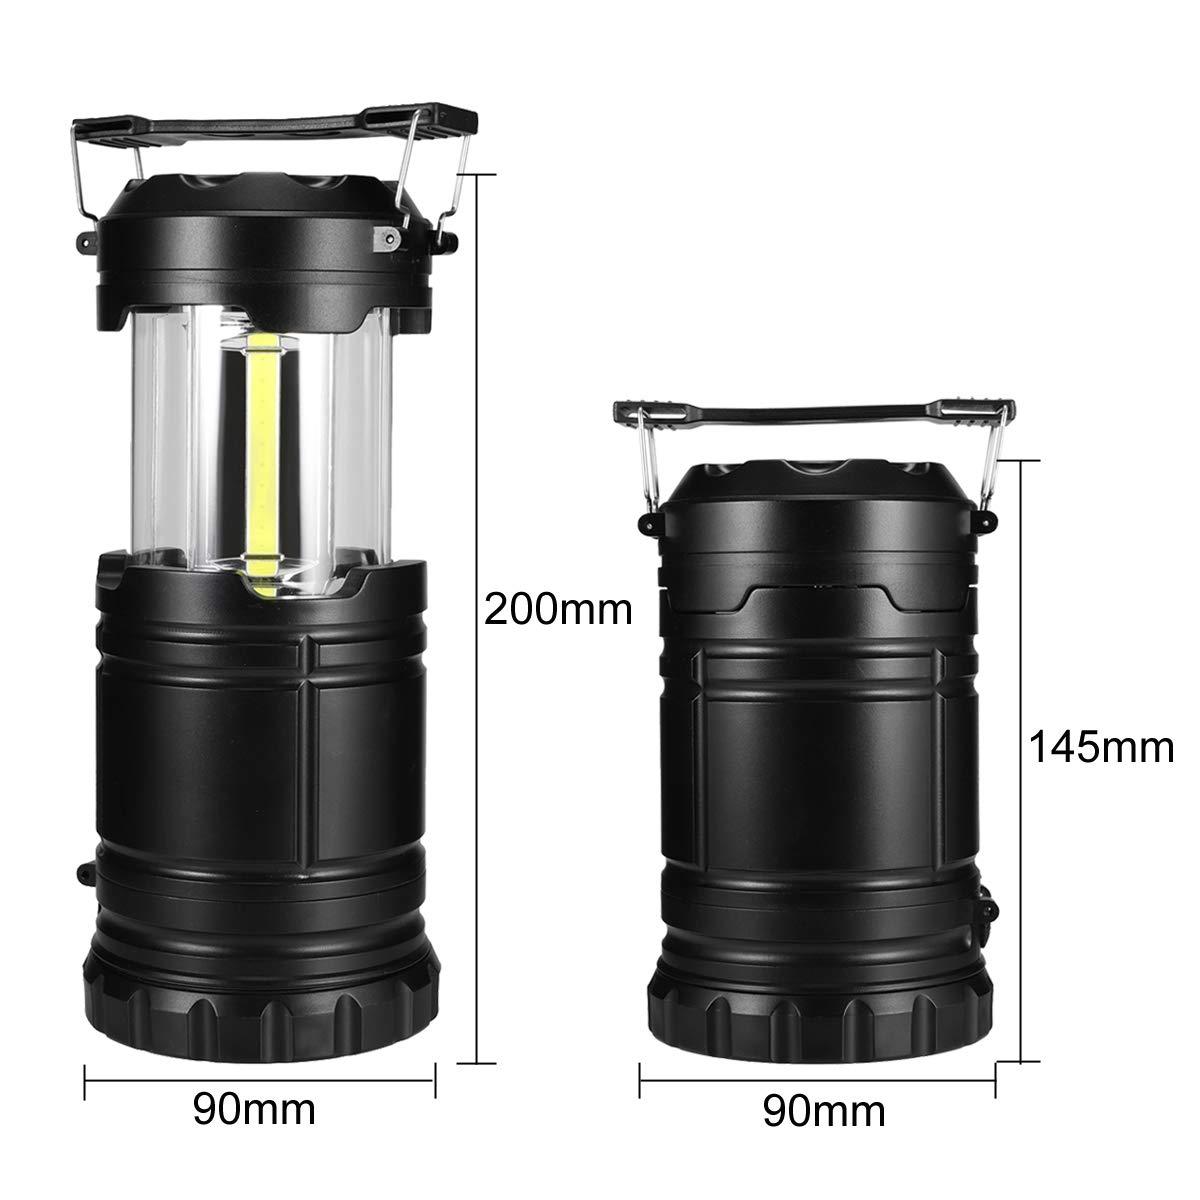 Copriwater Pieghevole Campeggio.Greensun Lampada Da Campeggio A Led Pieghevole Con 30 Led Funzionamento A Batteria Per Emergenza Luce Notturna Lanterna Portatile Da Giardino